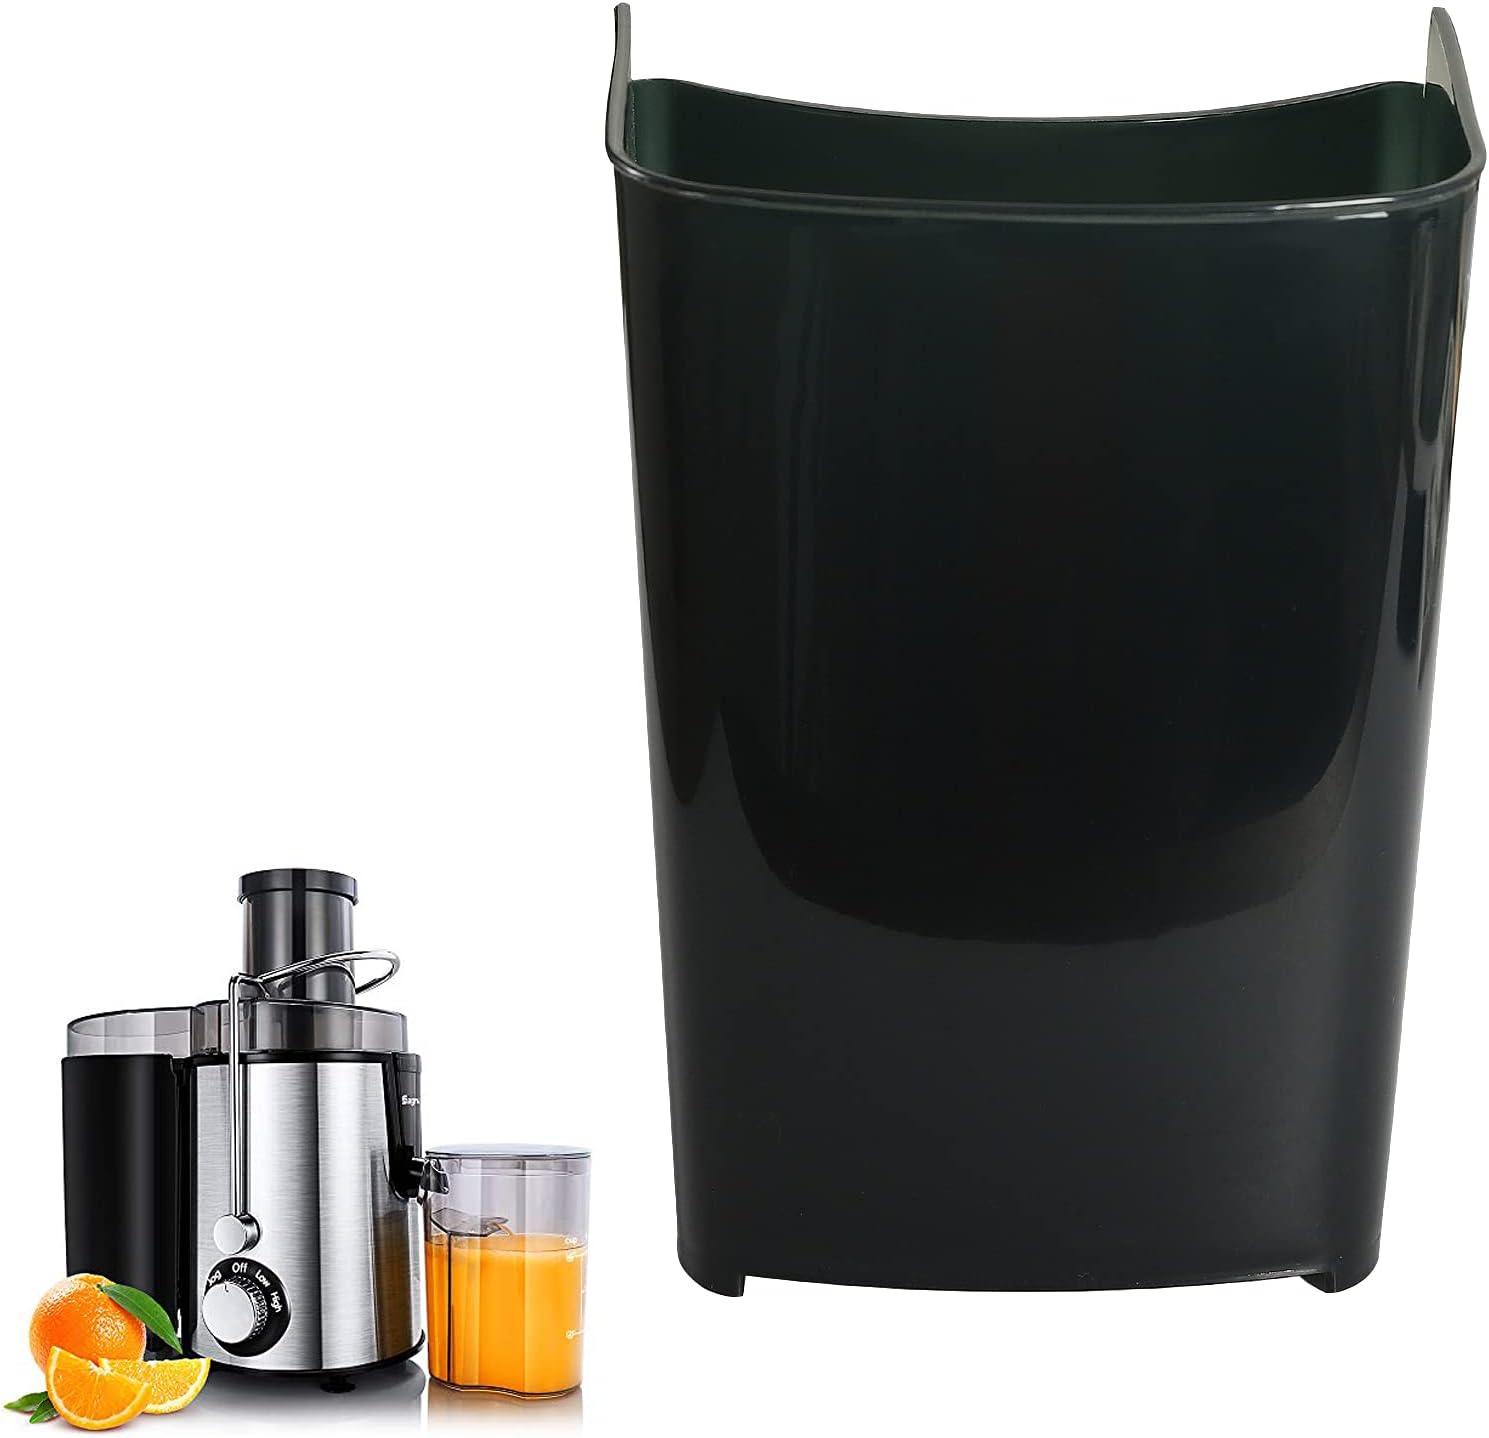 Pulp Collector Basket Replacement for Jack Lalanne Power Juicer CL003AP MT1000 Juicer Parts (Black)